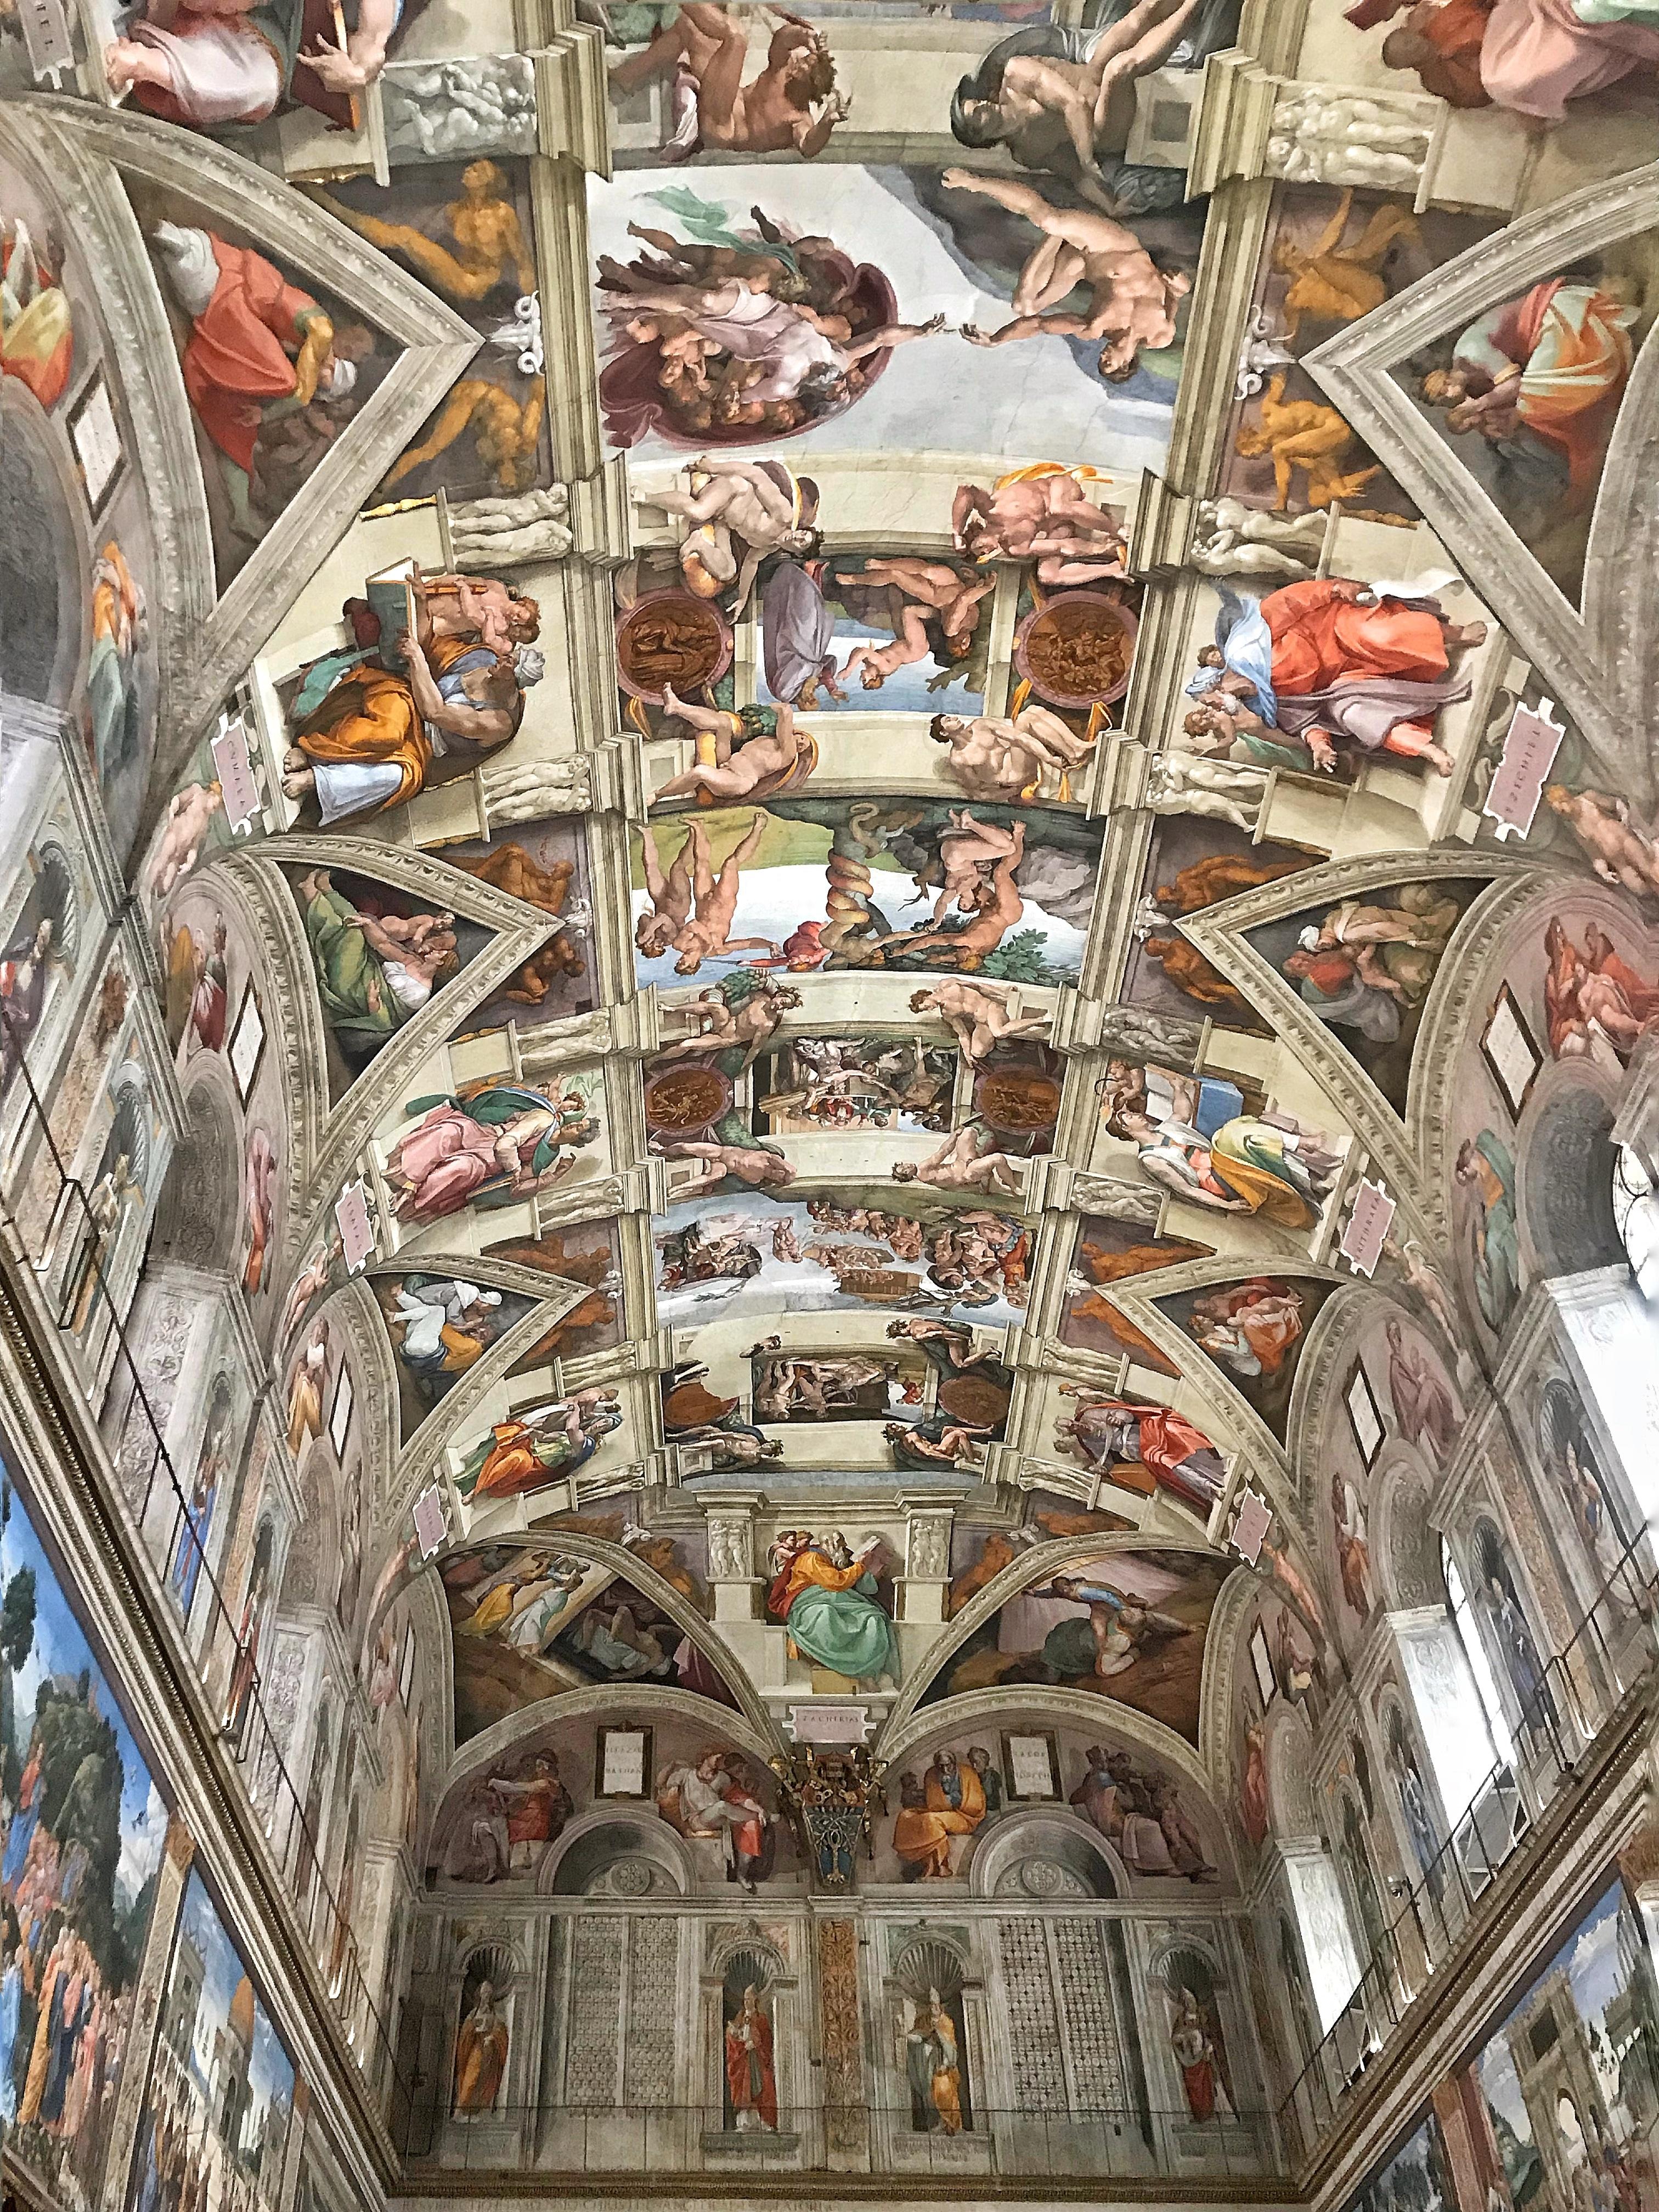 Rome April 2018 Sistine Chapel